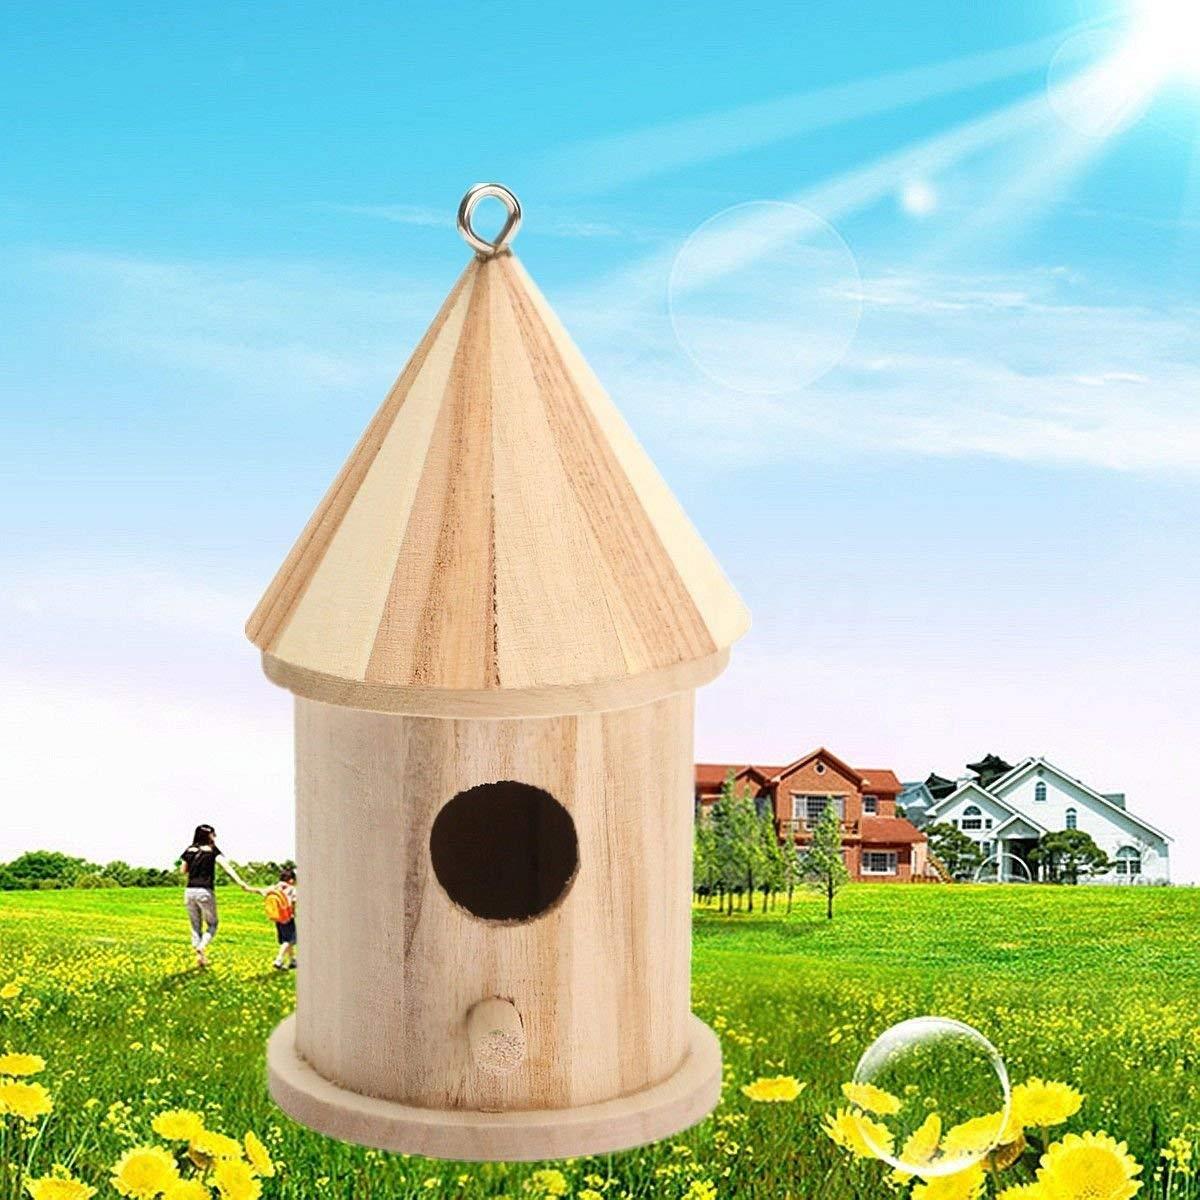 Seed Feeders NEW Home Garden Wooden Bird House Birdhouse Hanging Nest Nesting Box Decoration Kit